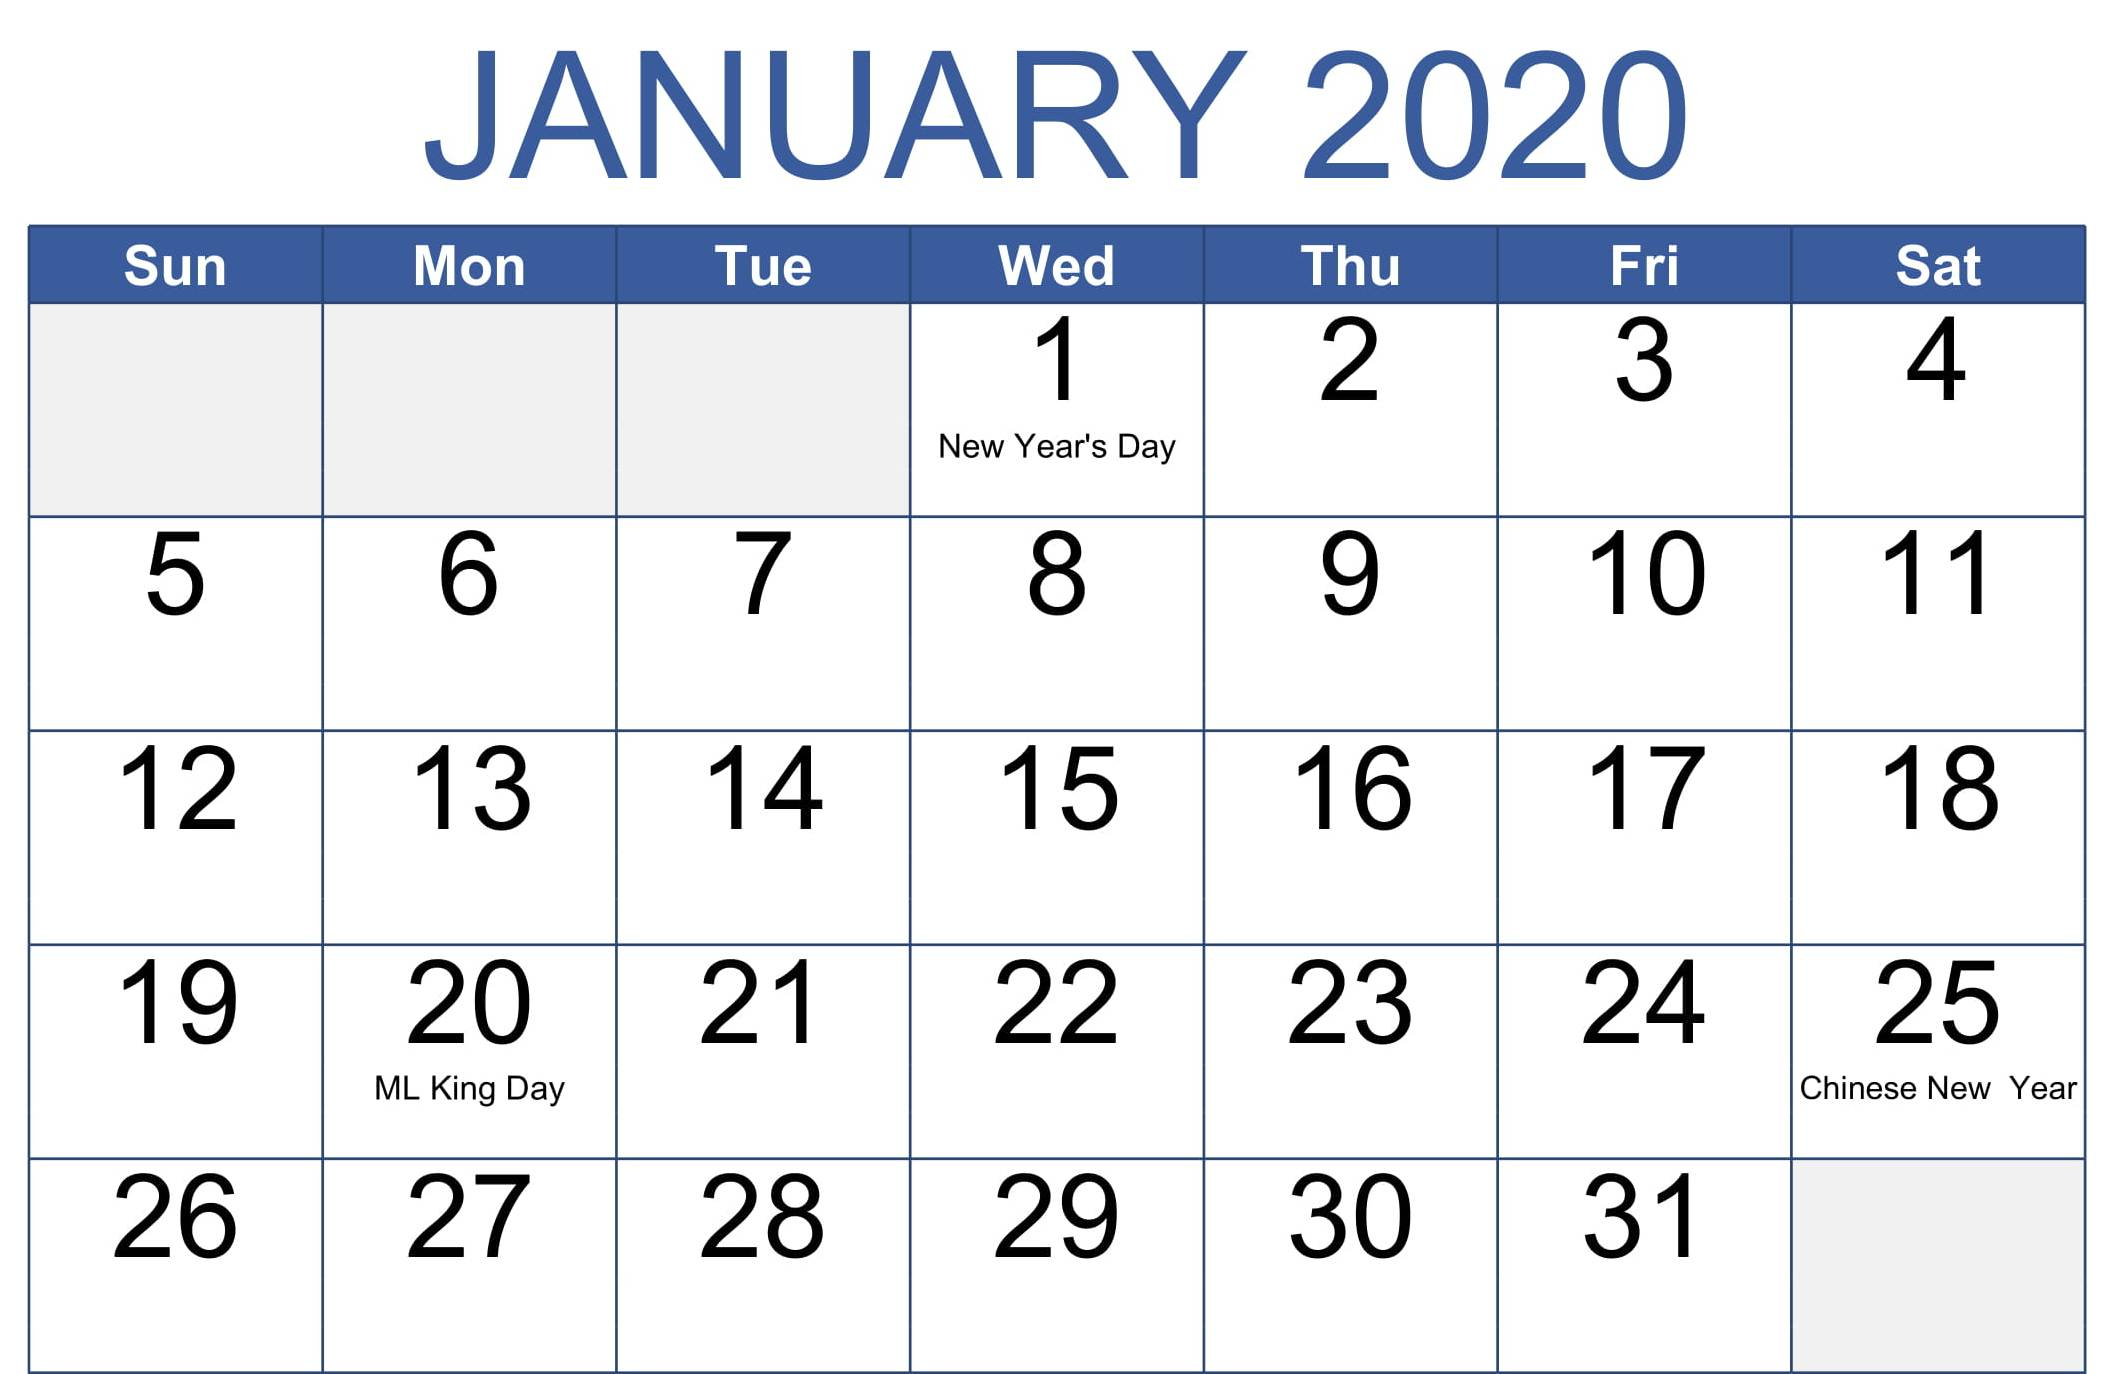 January 2020 Calendar With Holidays Word